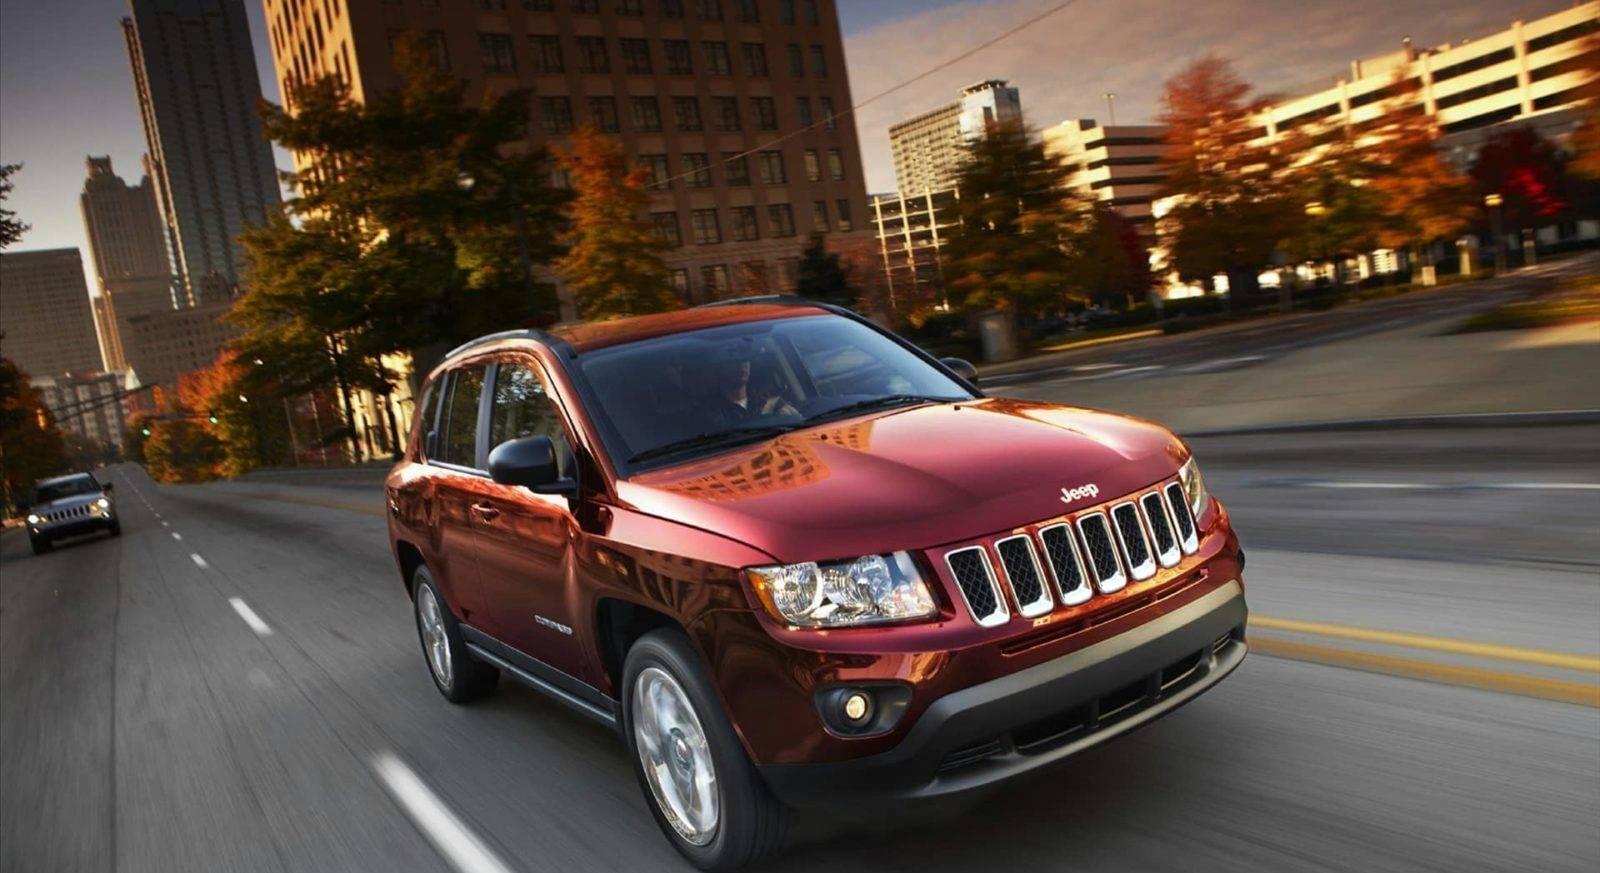 2011_jeep_compass-1920x1200